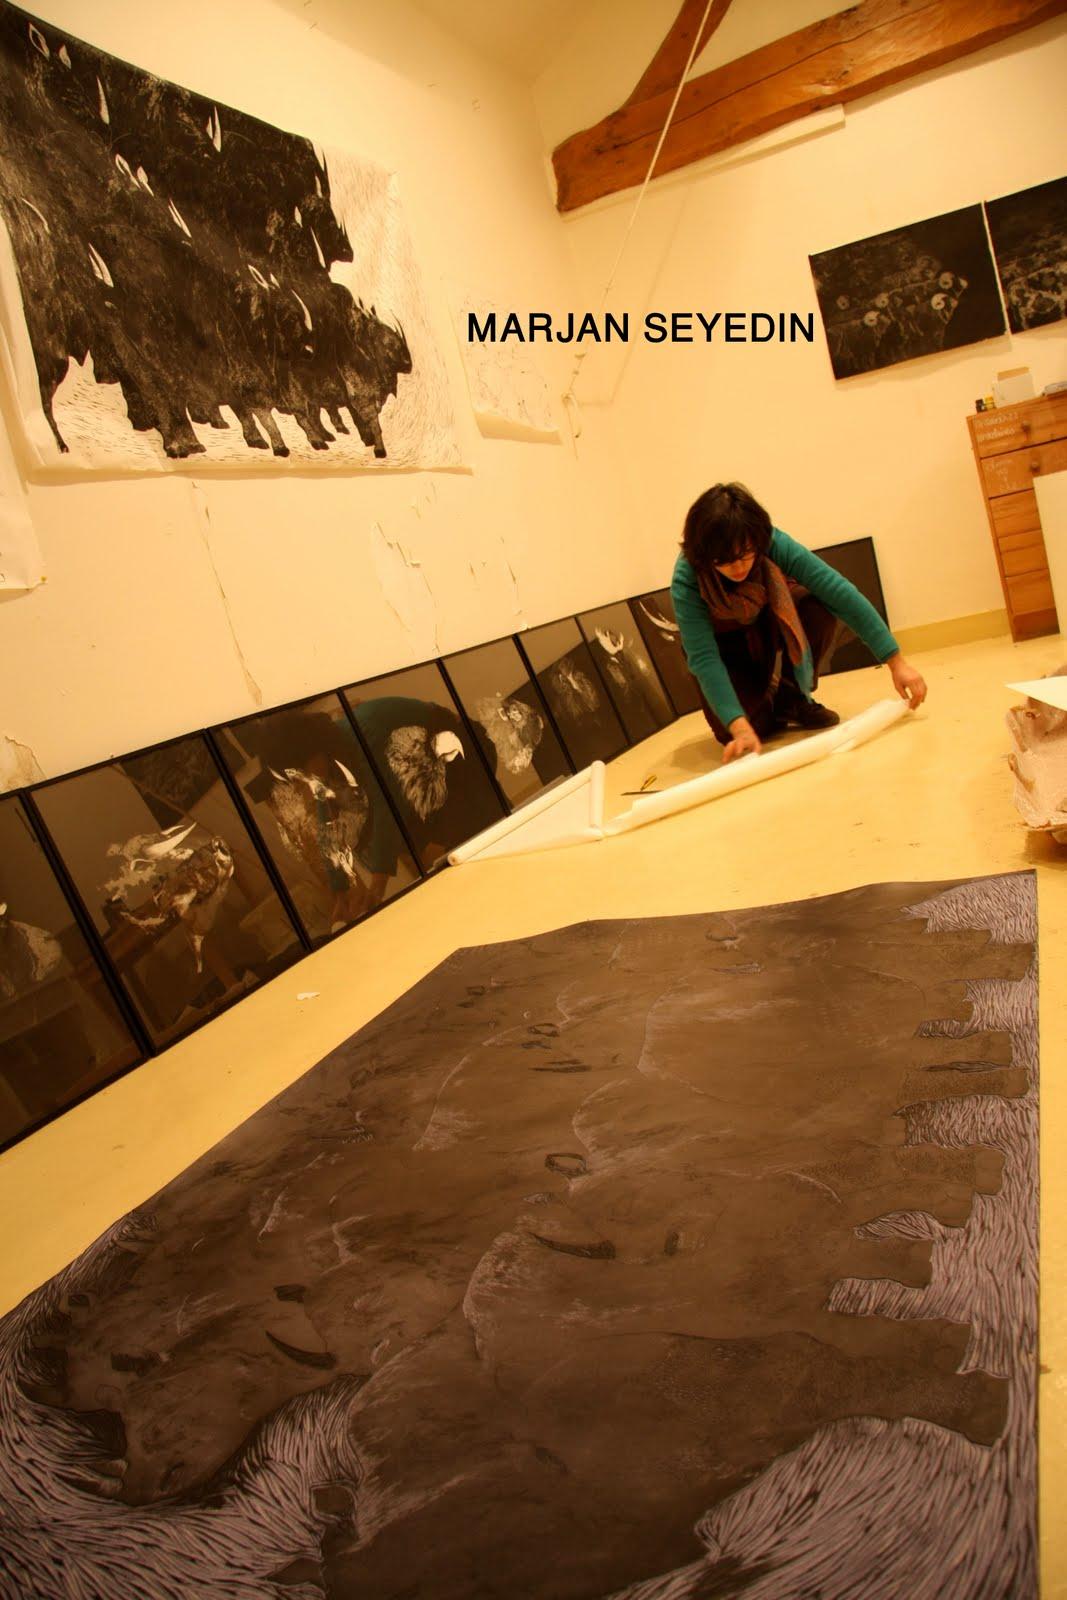 MARJAN SEYEDIN